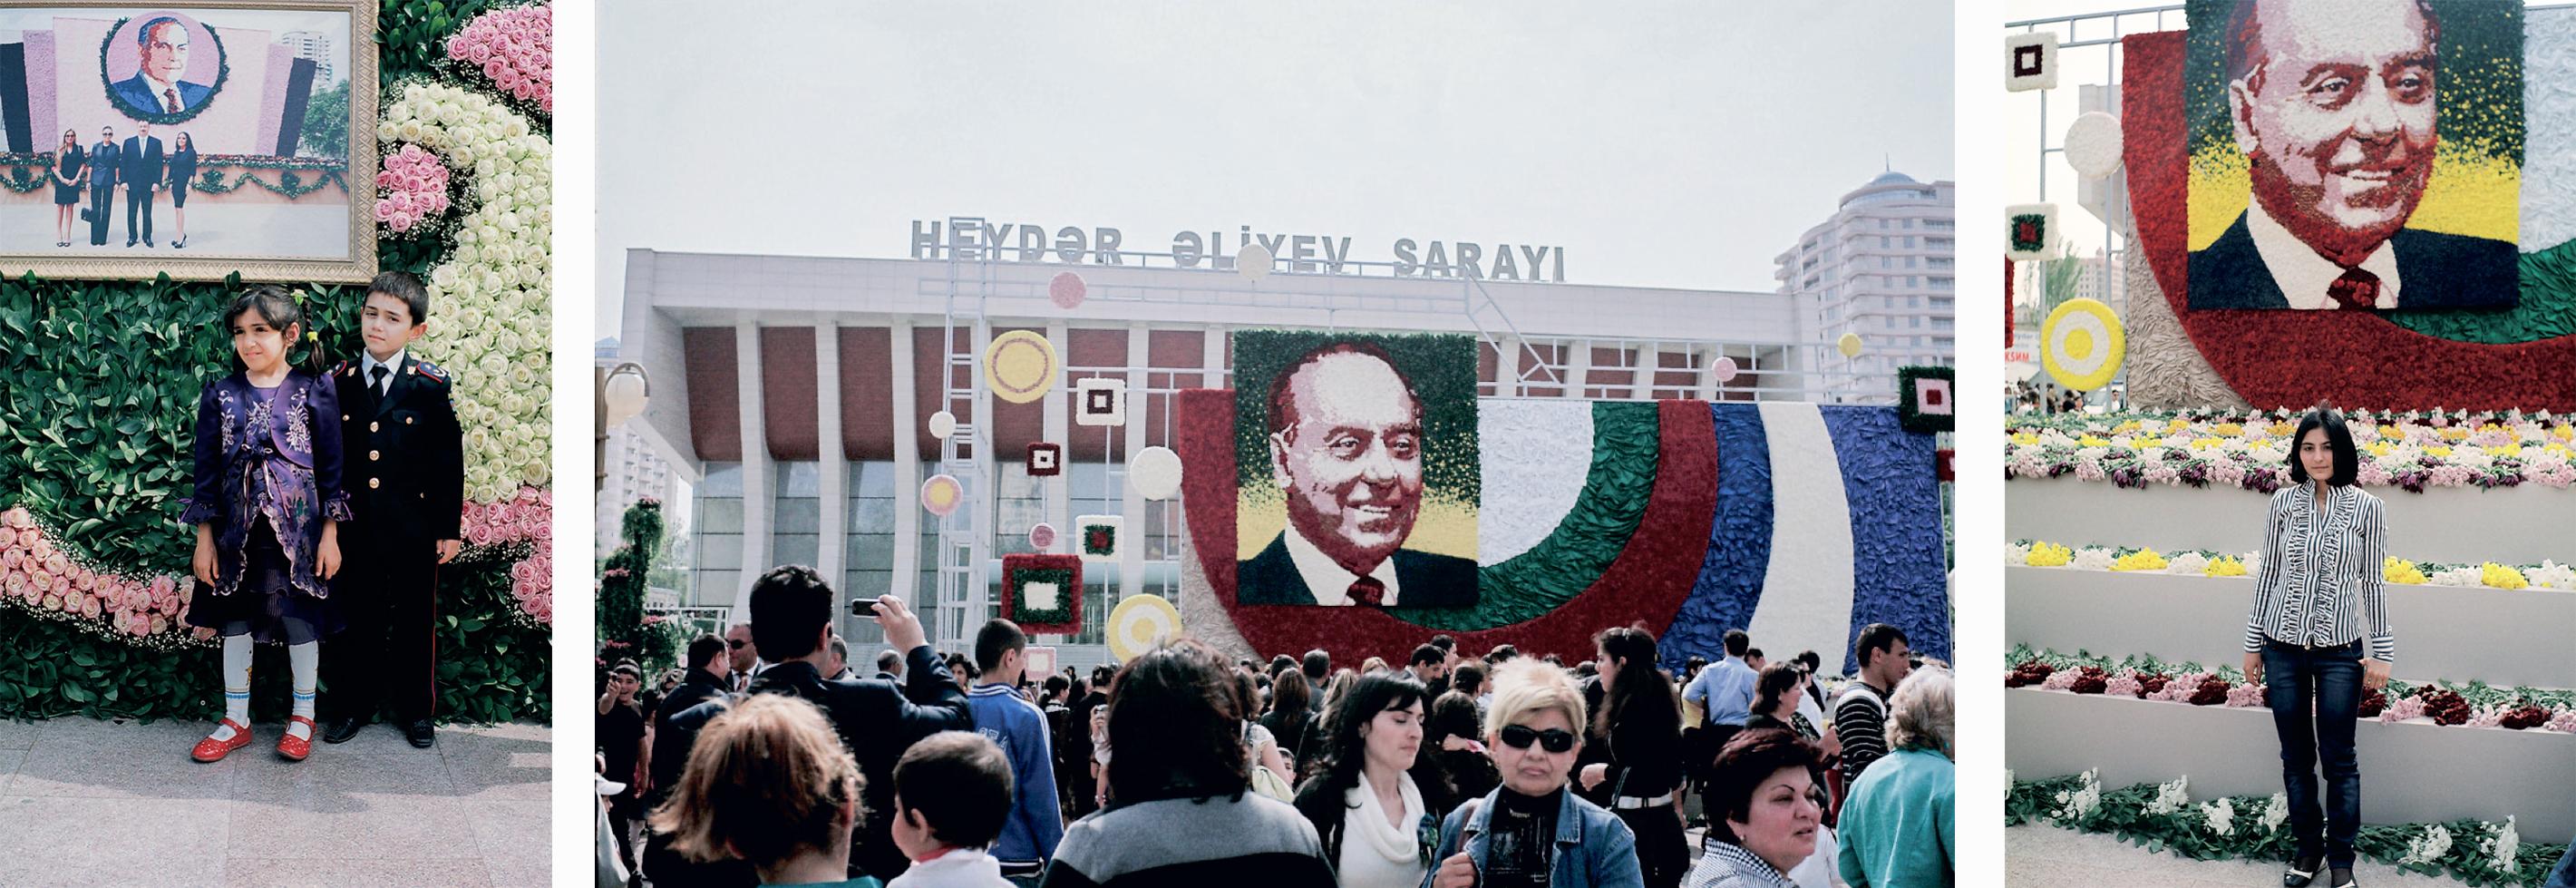 Flower Day, 2014 (Baku, Azerbaijan) Since 2004, Azerbaijan has celebrated the birthday of former Pre ...